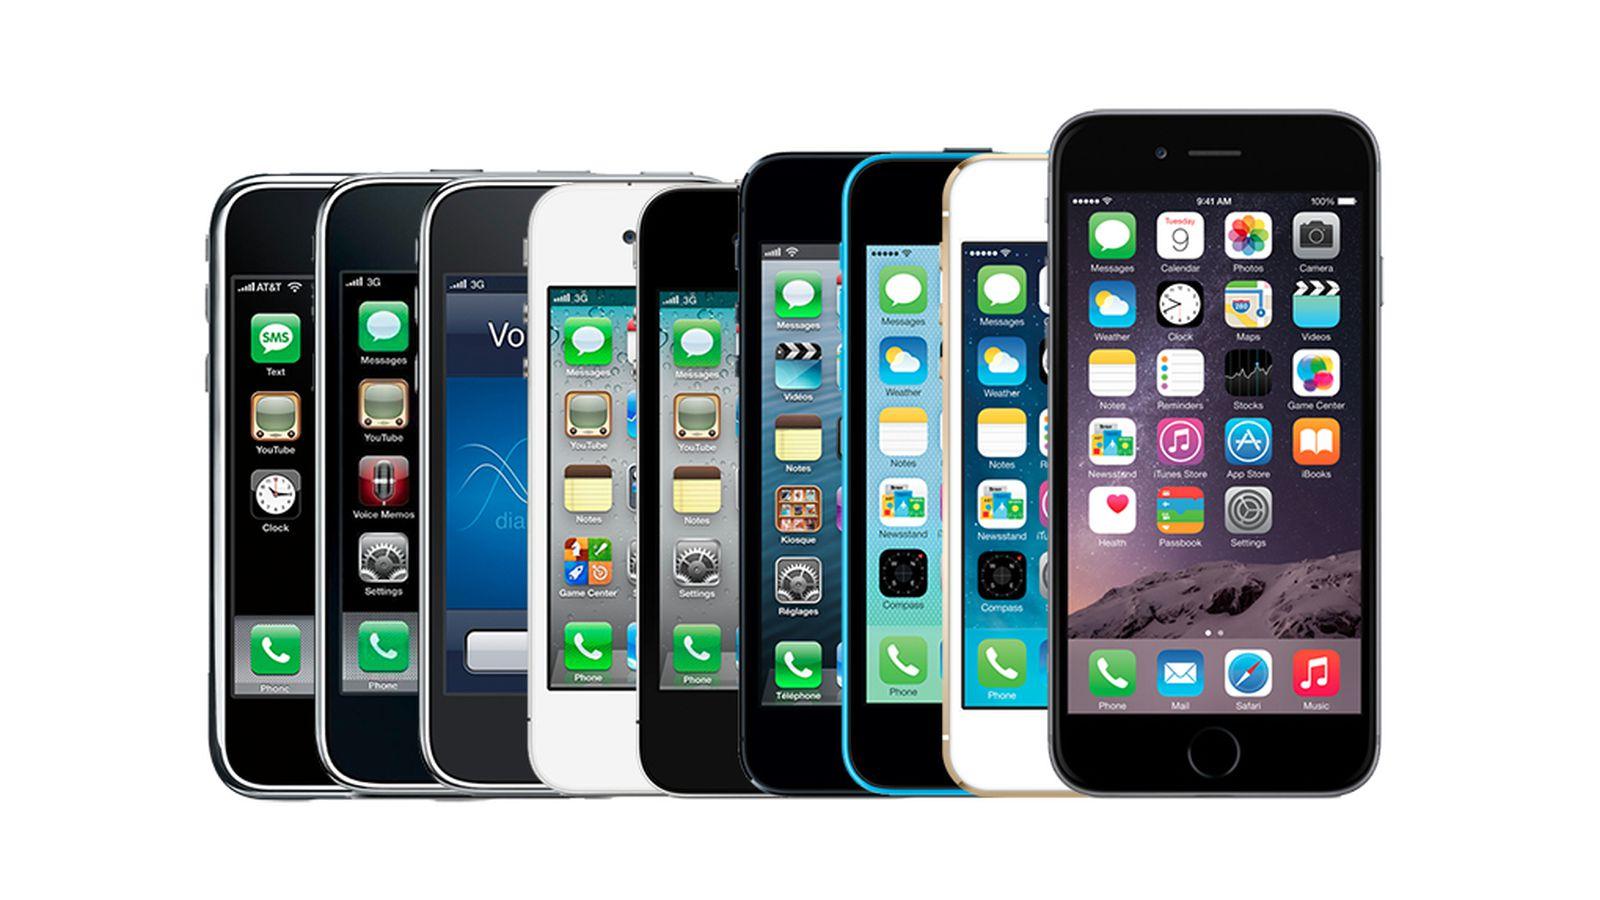 First Iphone Ever Made iPhone: A visua...